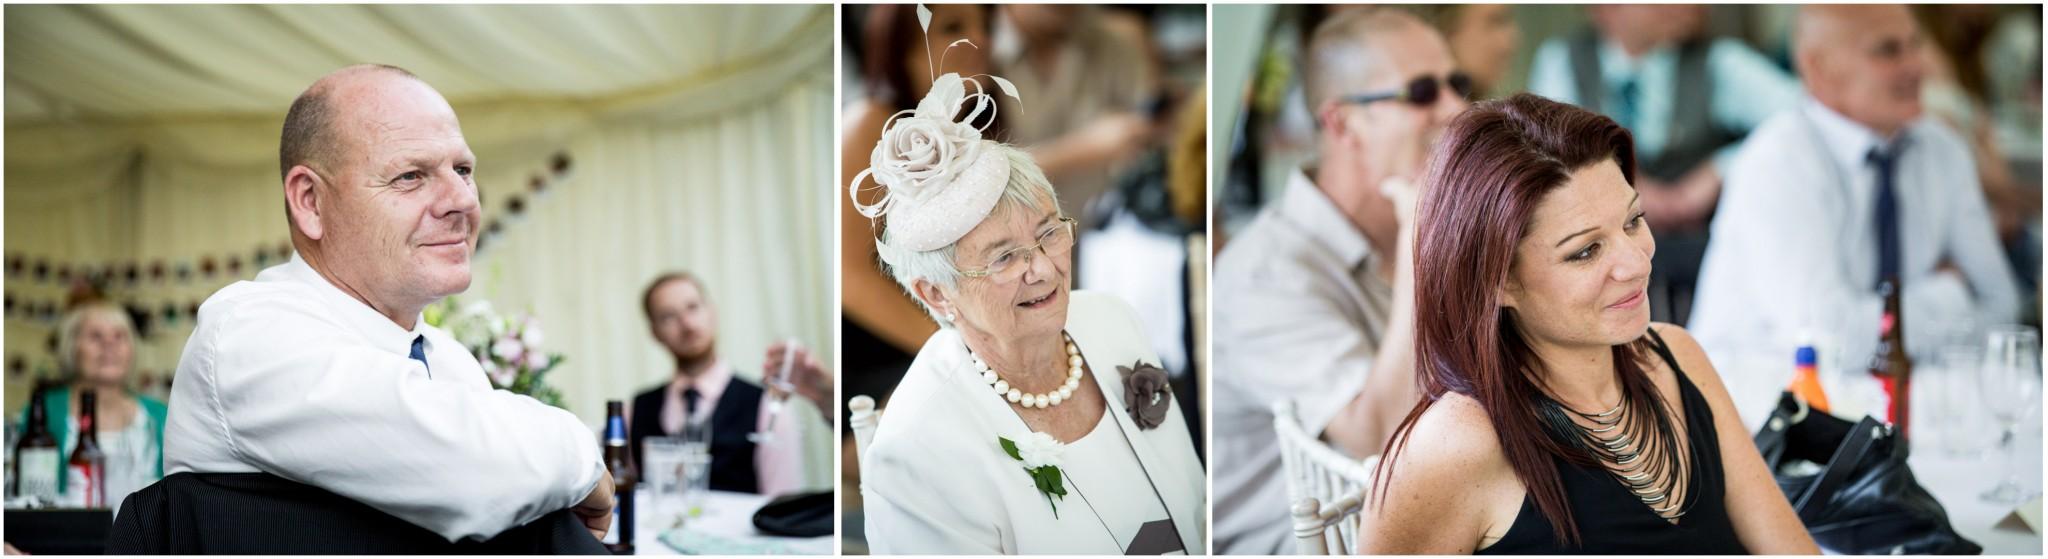 Tournerbury Woods Estate Wedding Guests listen to Groom play ukelele